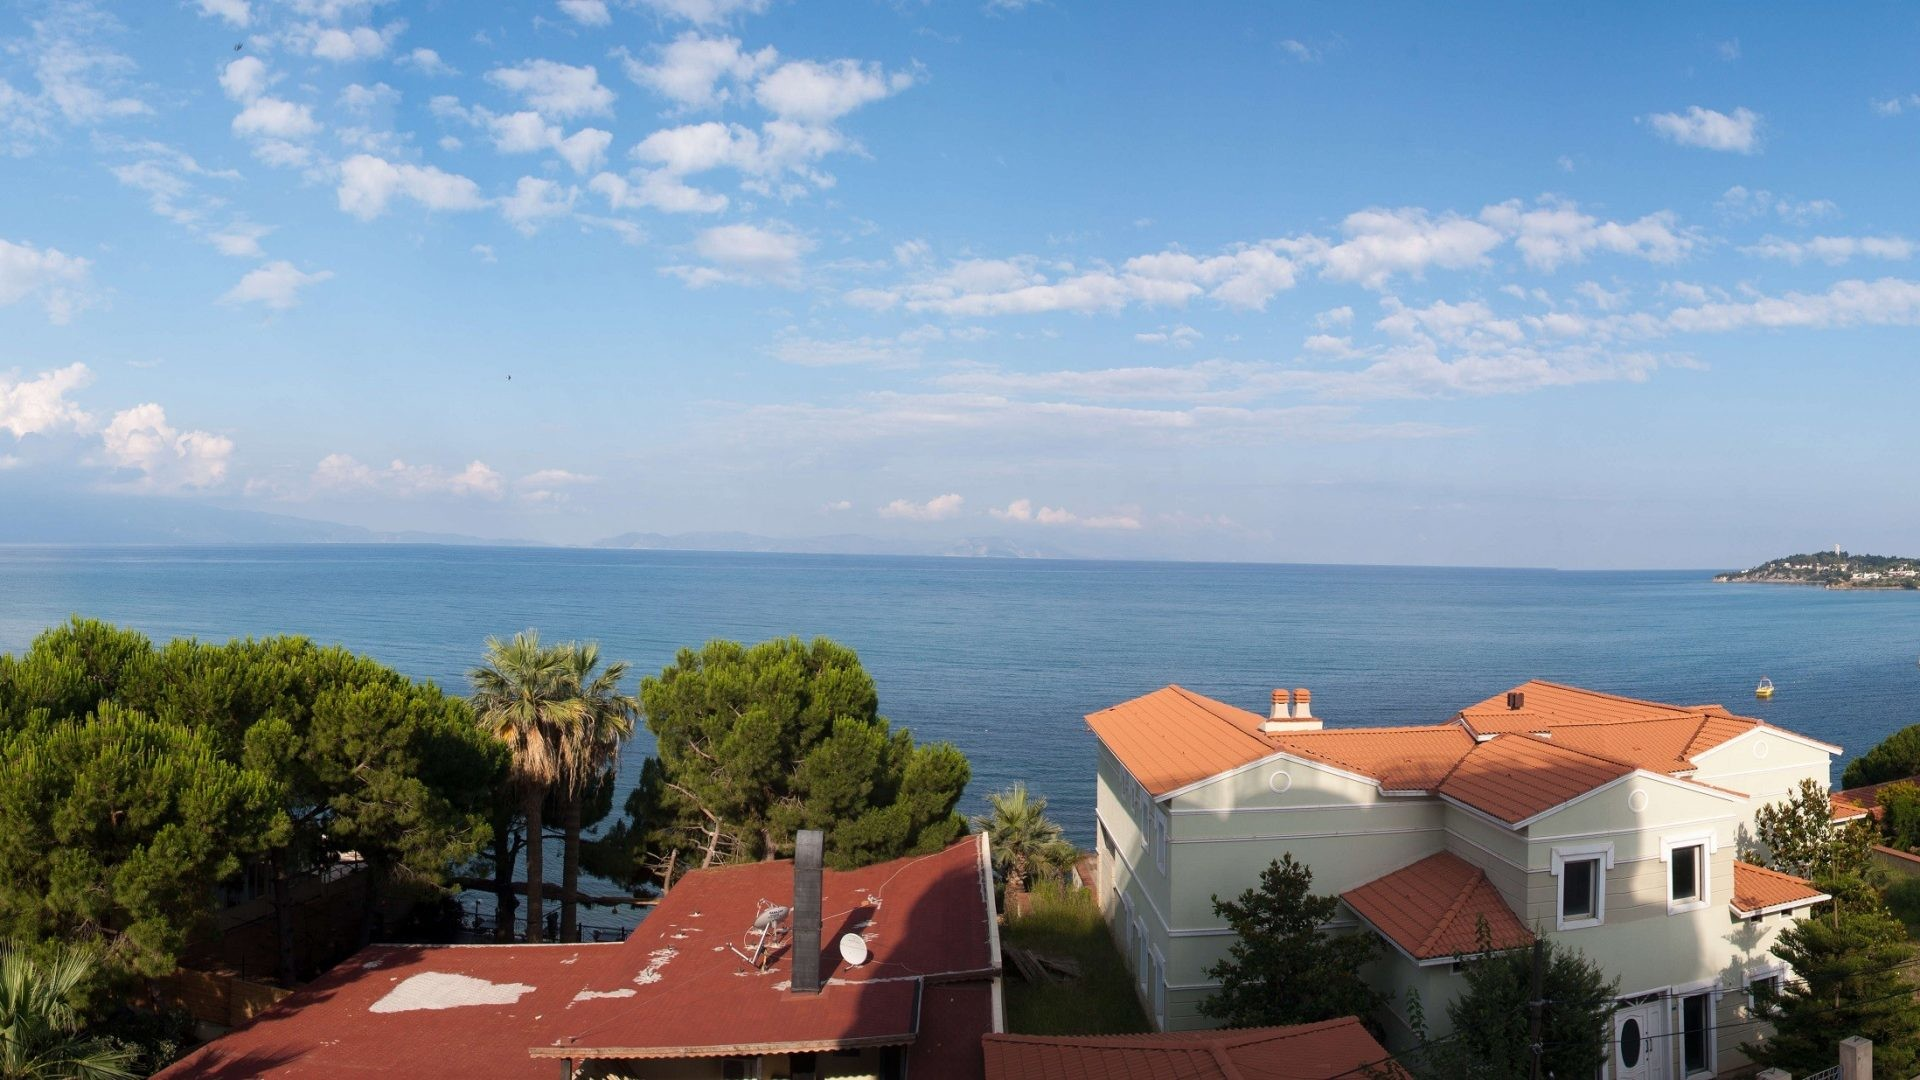 Beaches Hoidays Sea Crete View Nature Summer Resorts Panoramic Greece Ocean Beach  Wallpaper Collection : Beaches